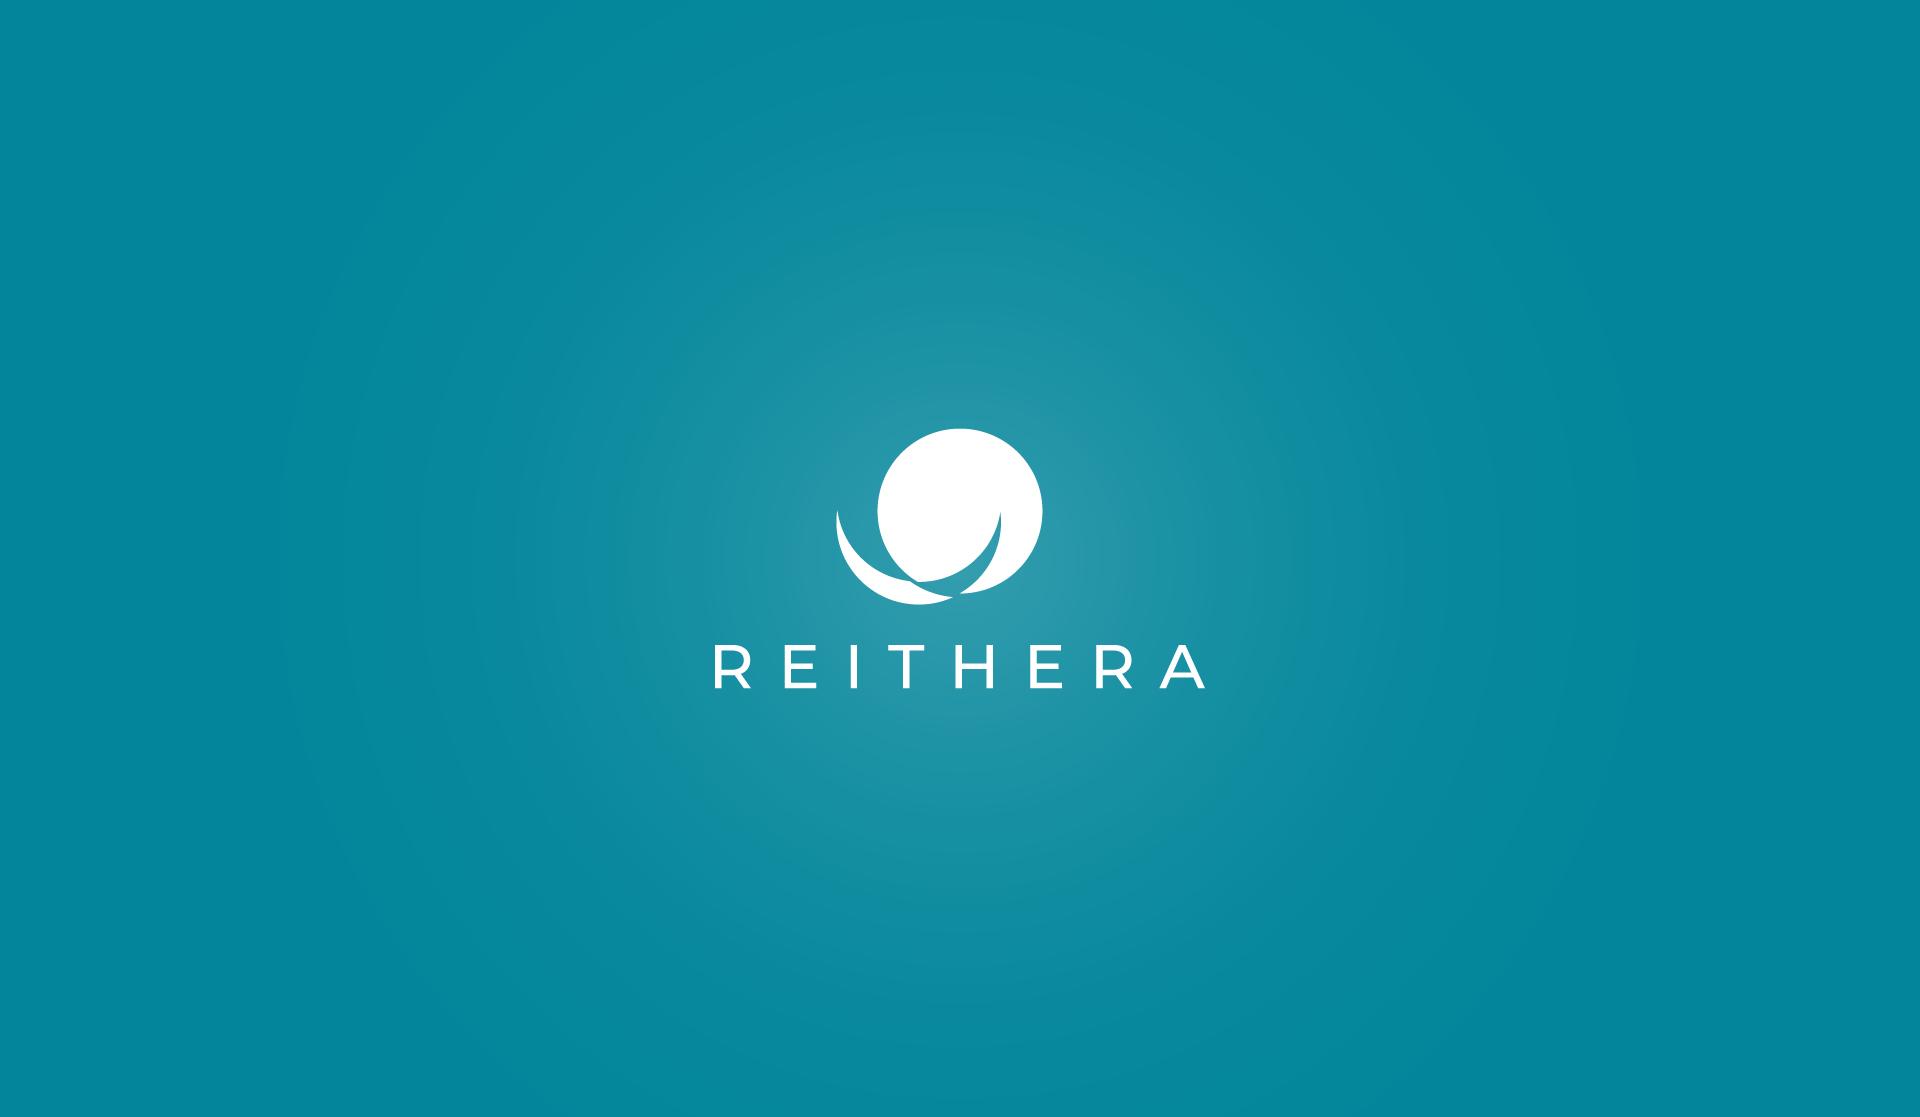 bouncy-particle-comunicazione-marketing-roma-reithera